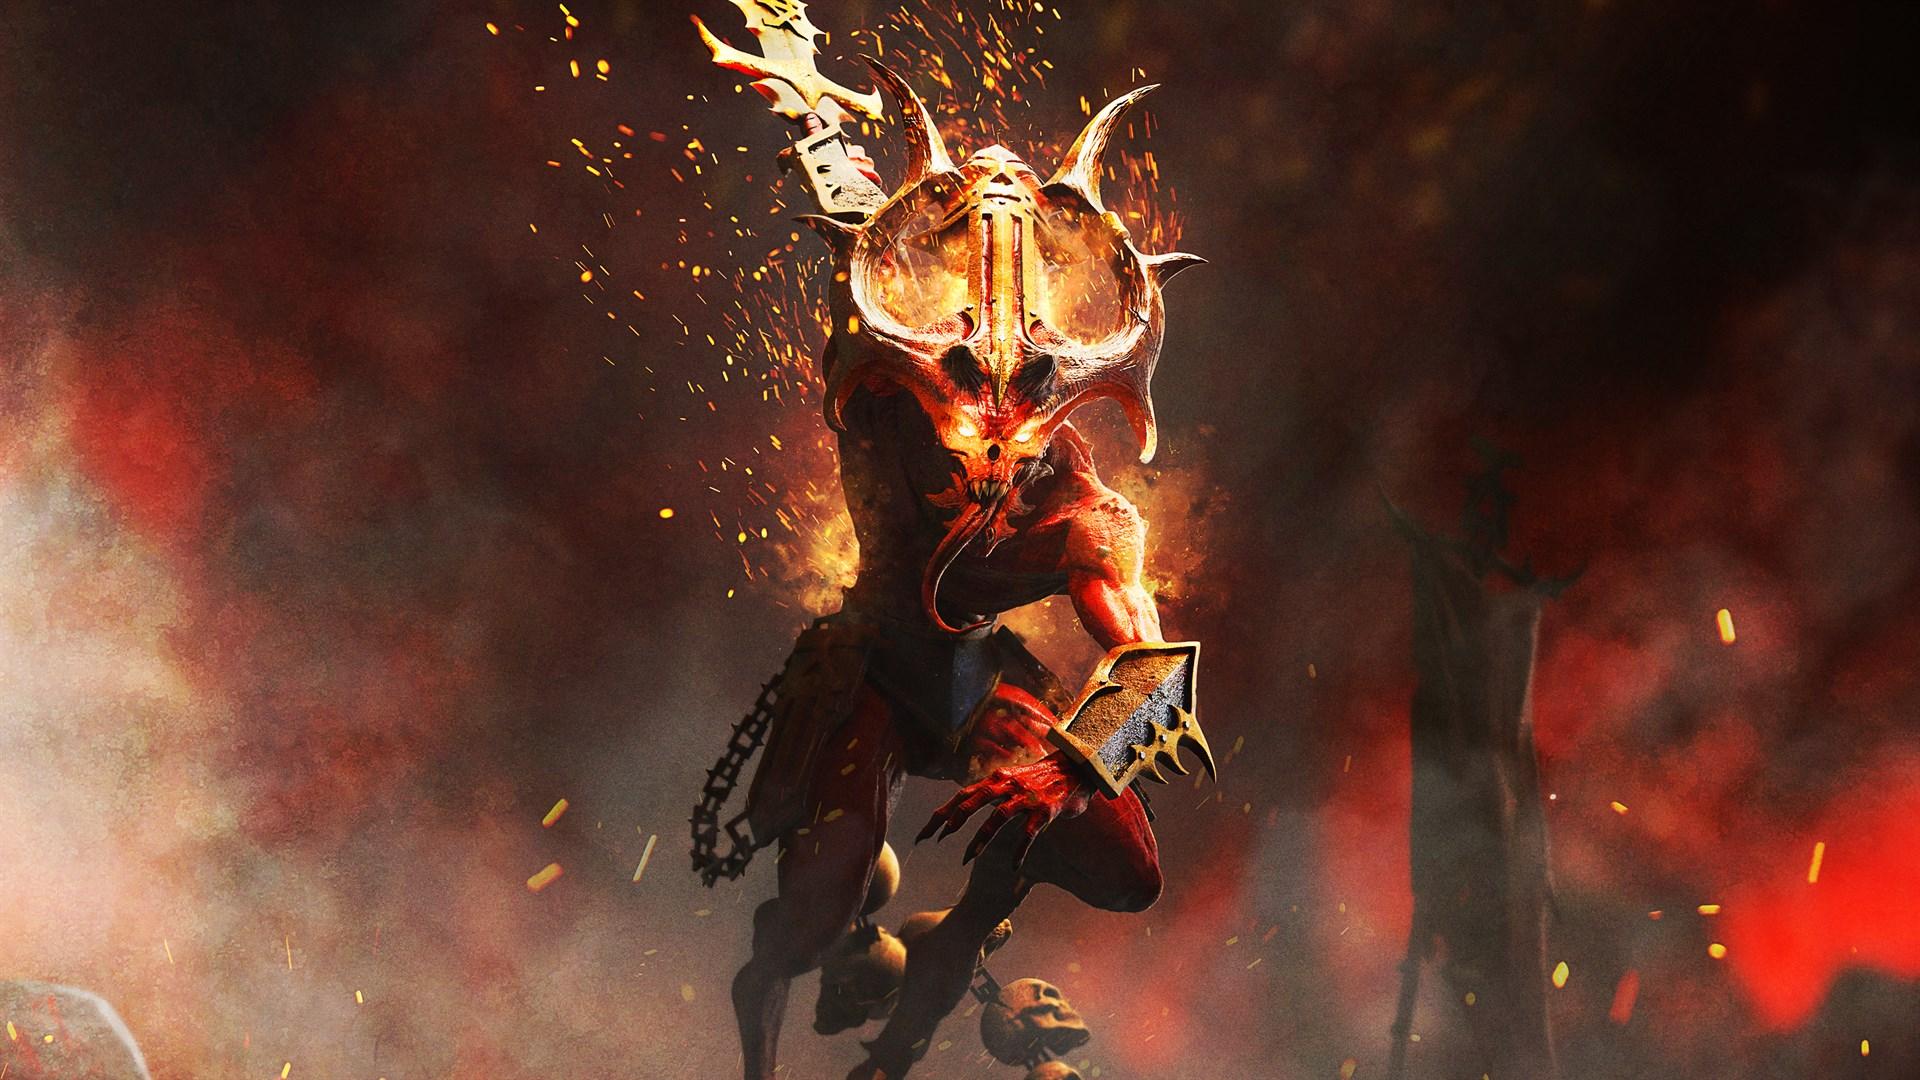 Warhammer: Chaosbane Emote Pack